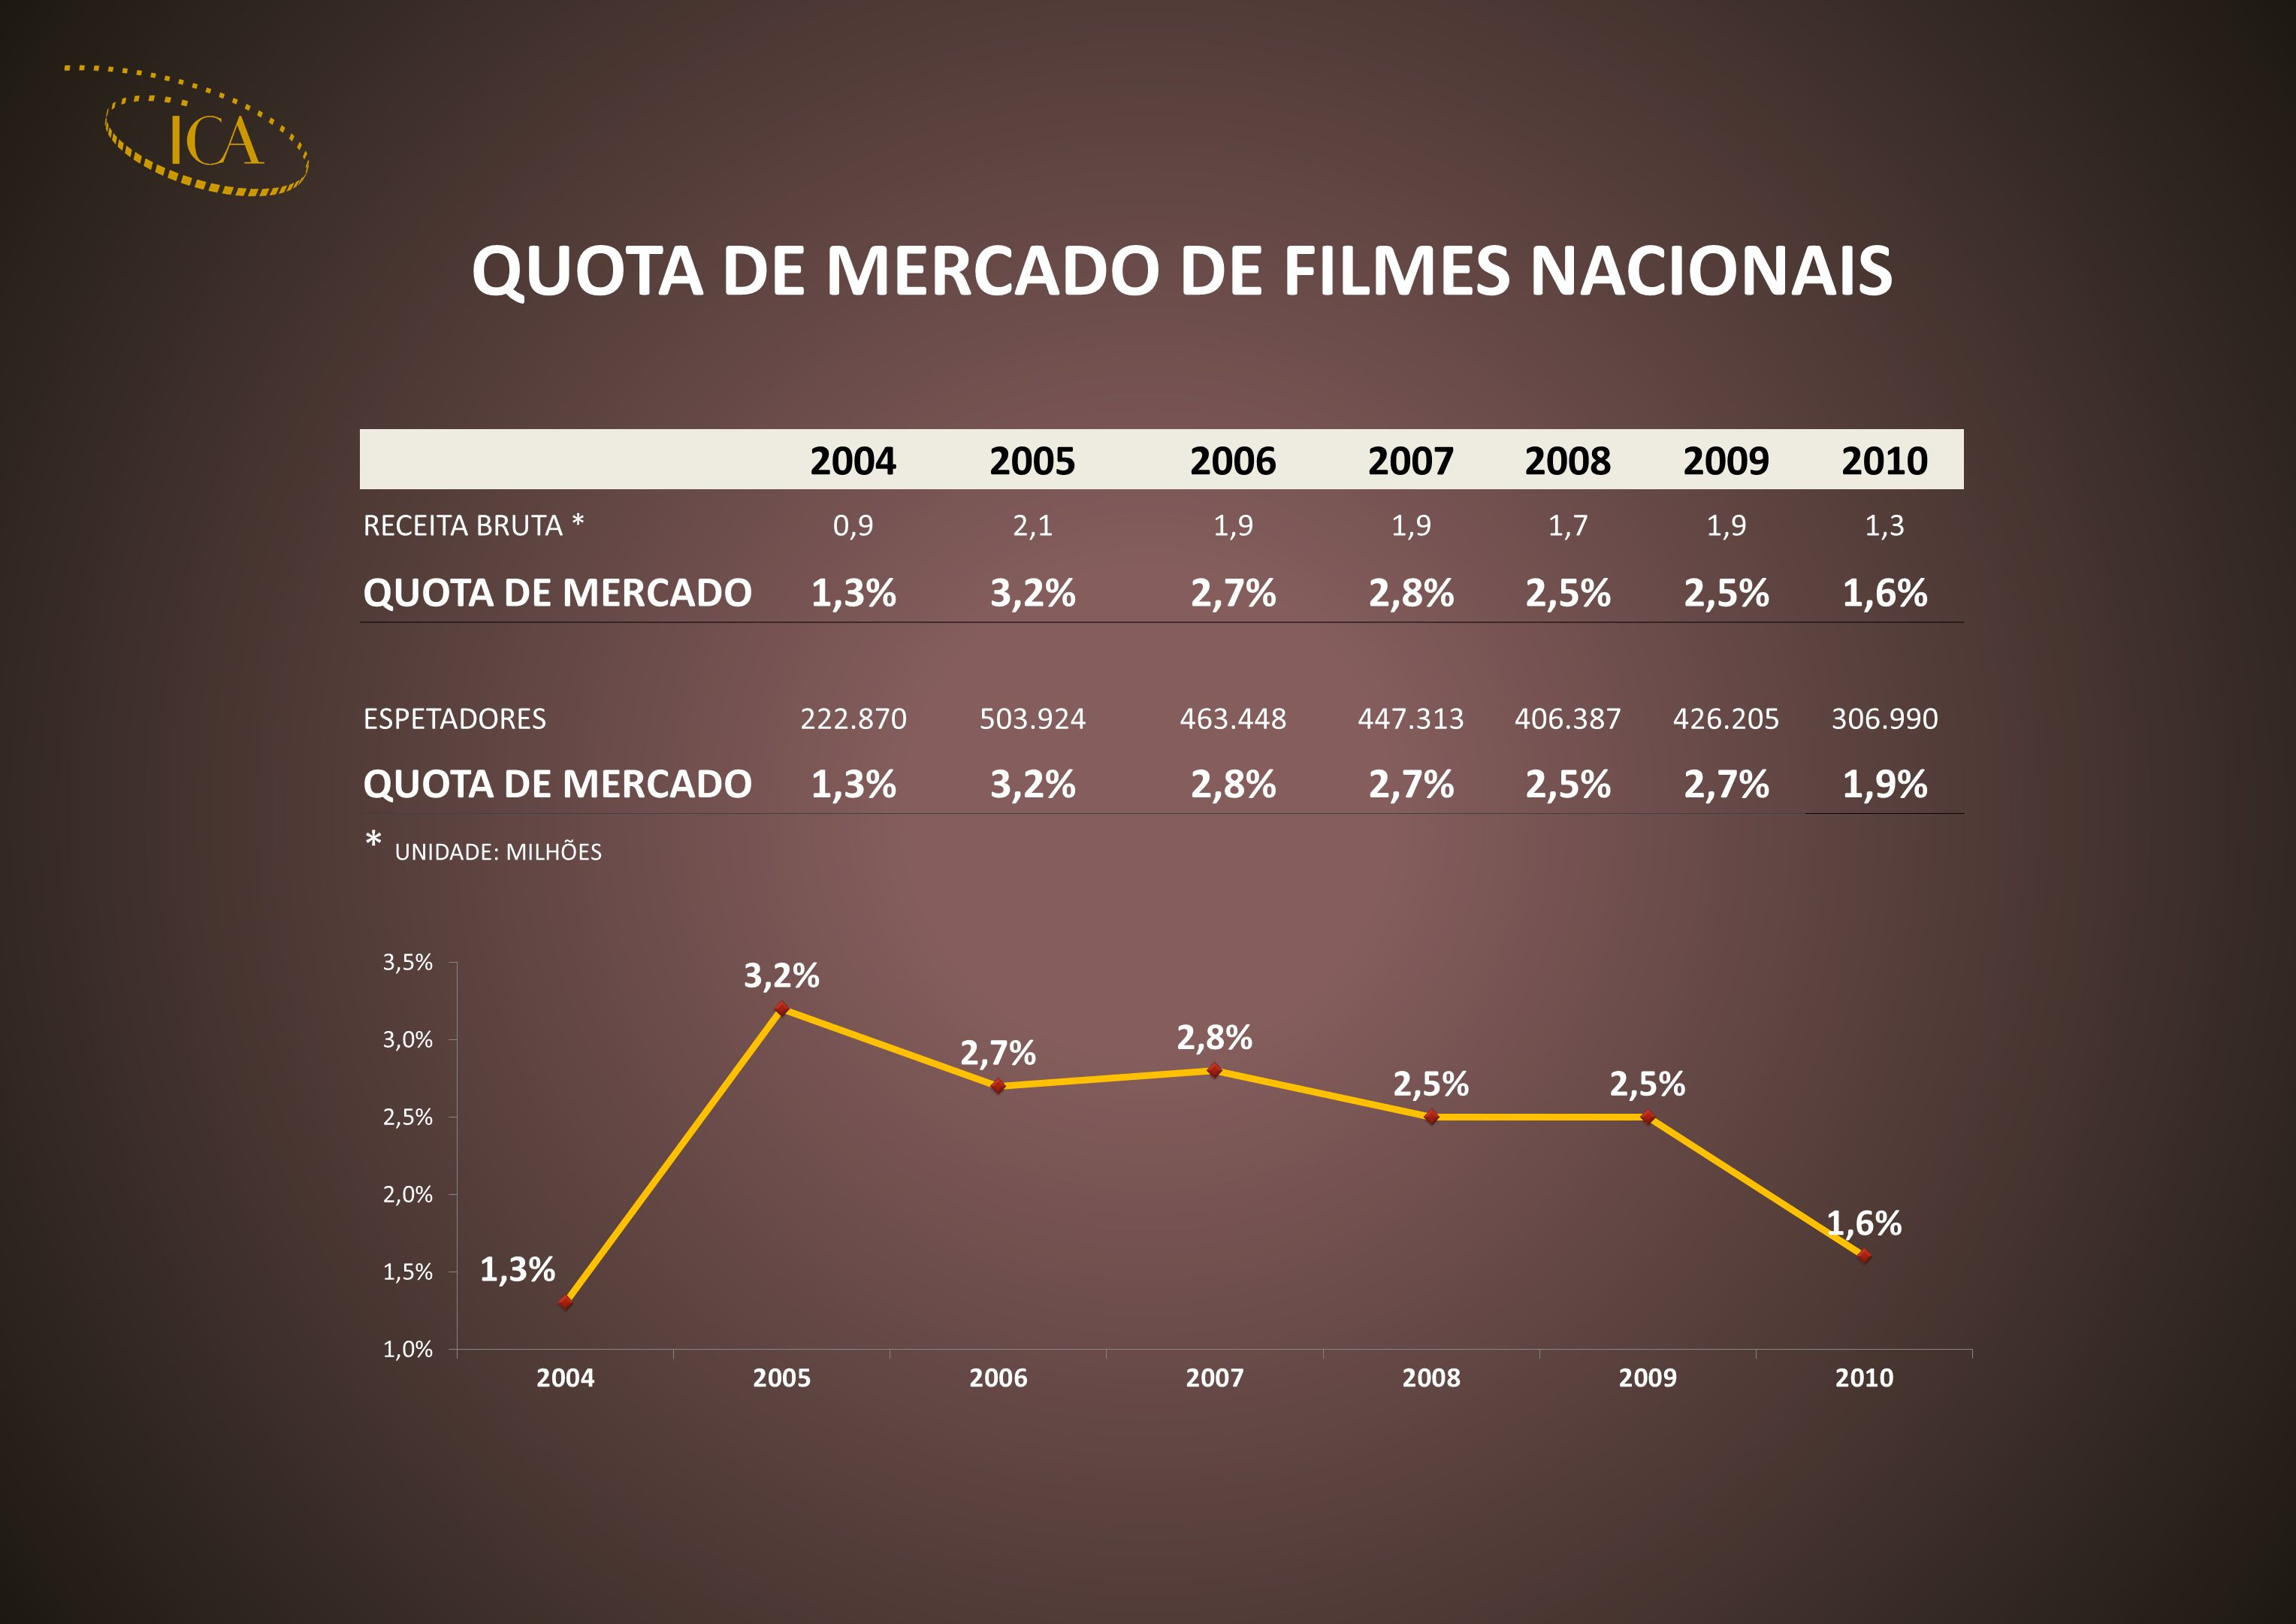 QUOTA DE MERCADO DE FILMES NACIONAIS